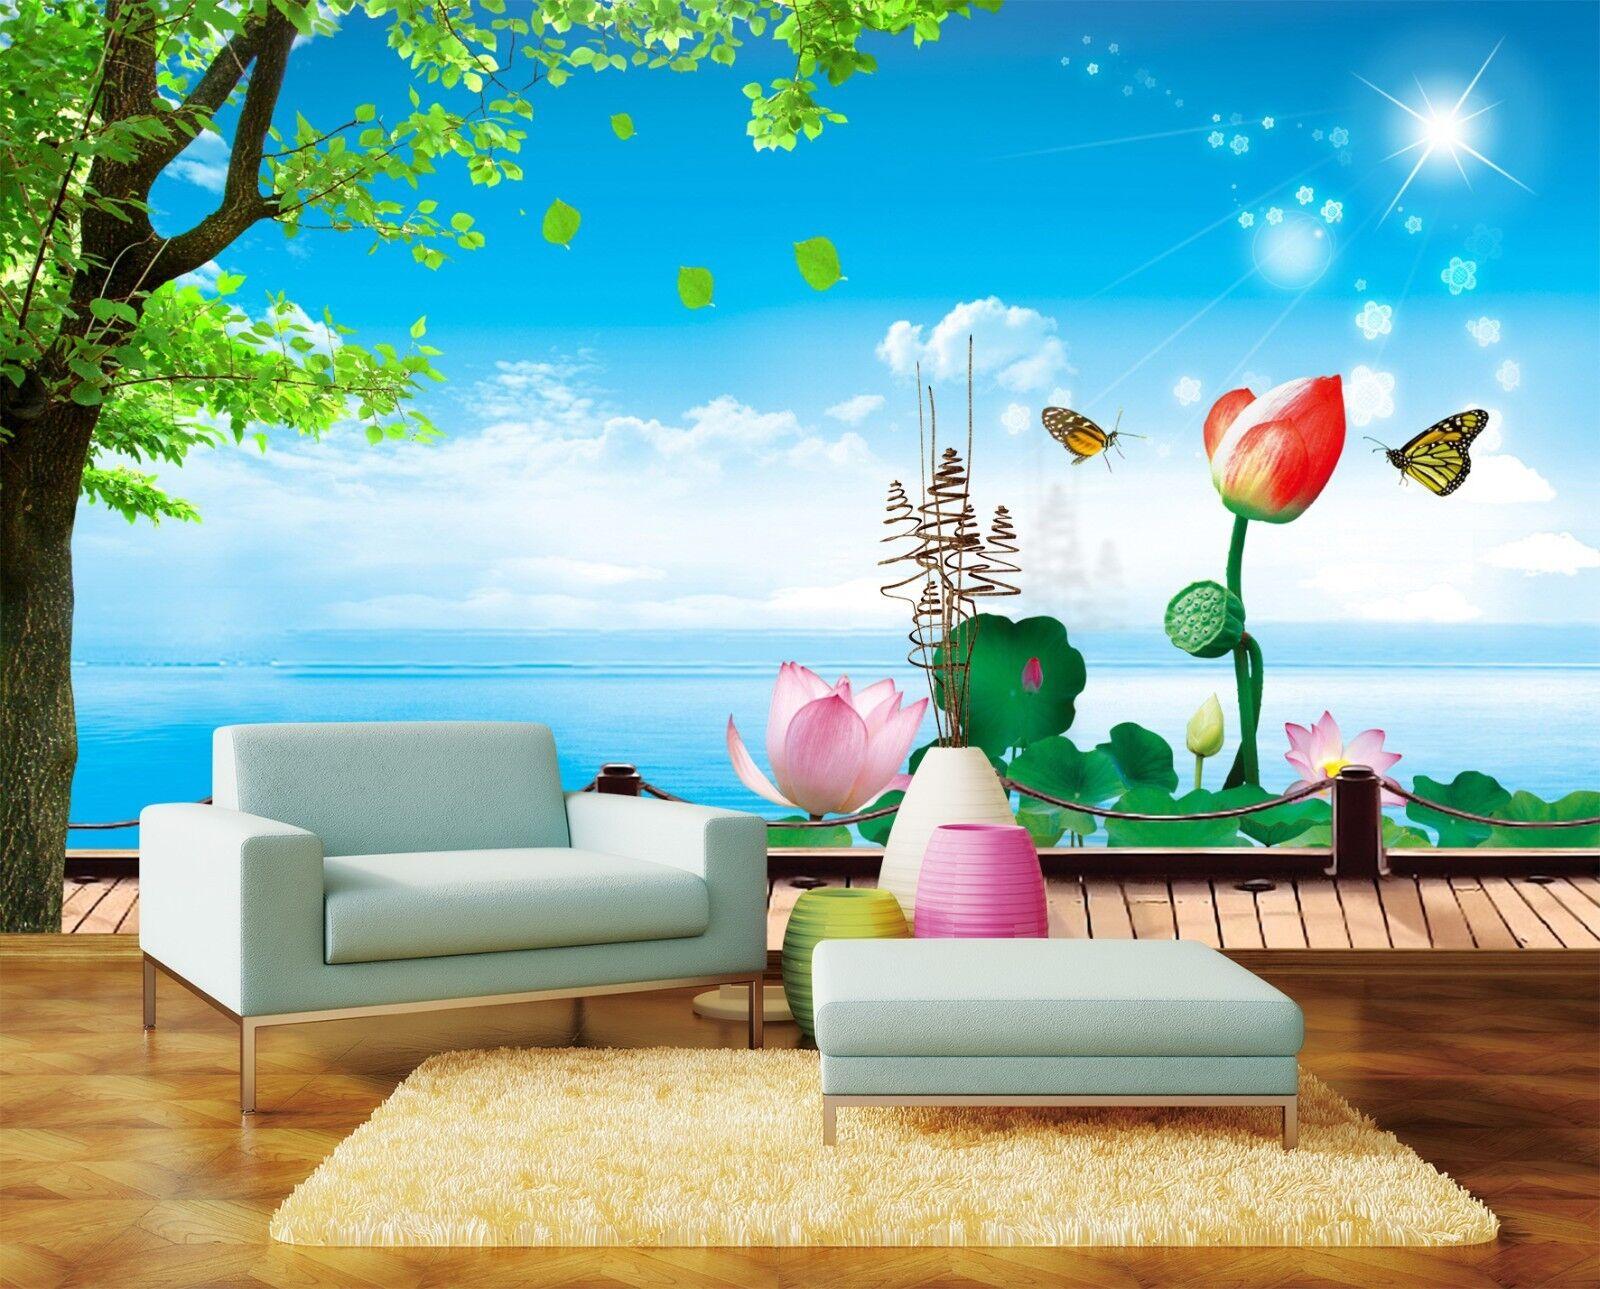 3D Blauen Himmels Teich Lotos 8 Tapete Wandgemälde Tapeten Bild Familie DE Lemon  | Online Outlet Store  | Passend In Der Farbe  | Primäre Qualität